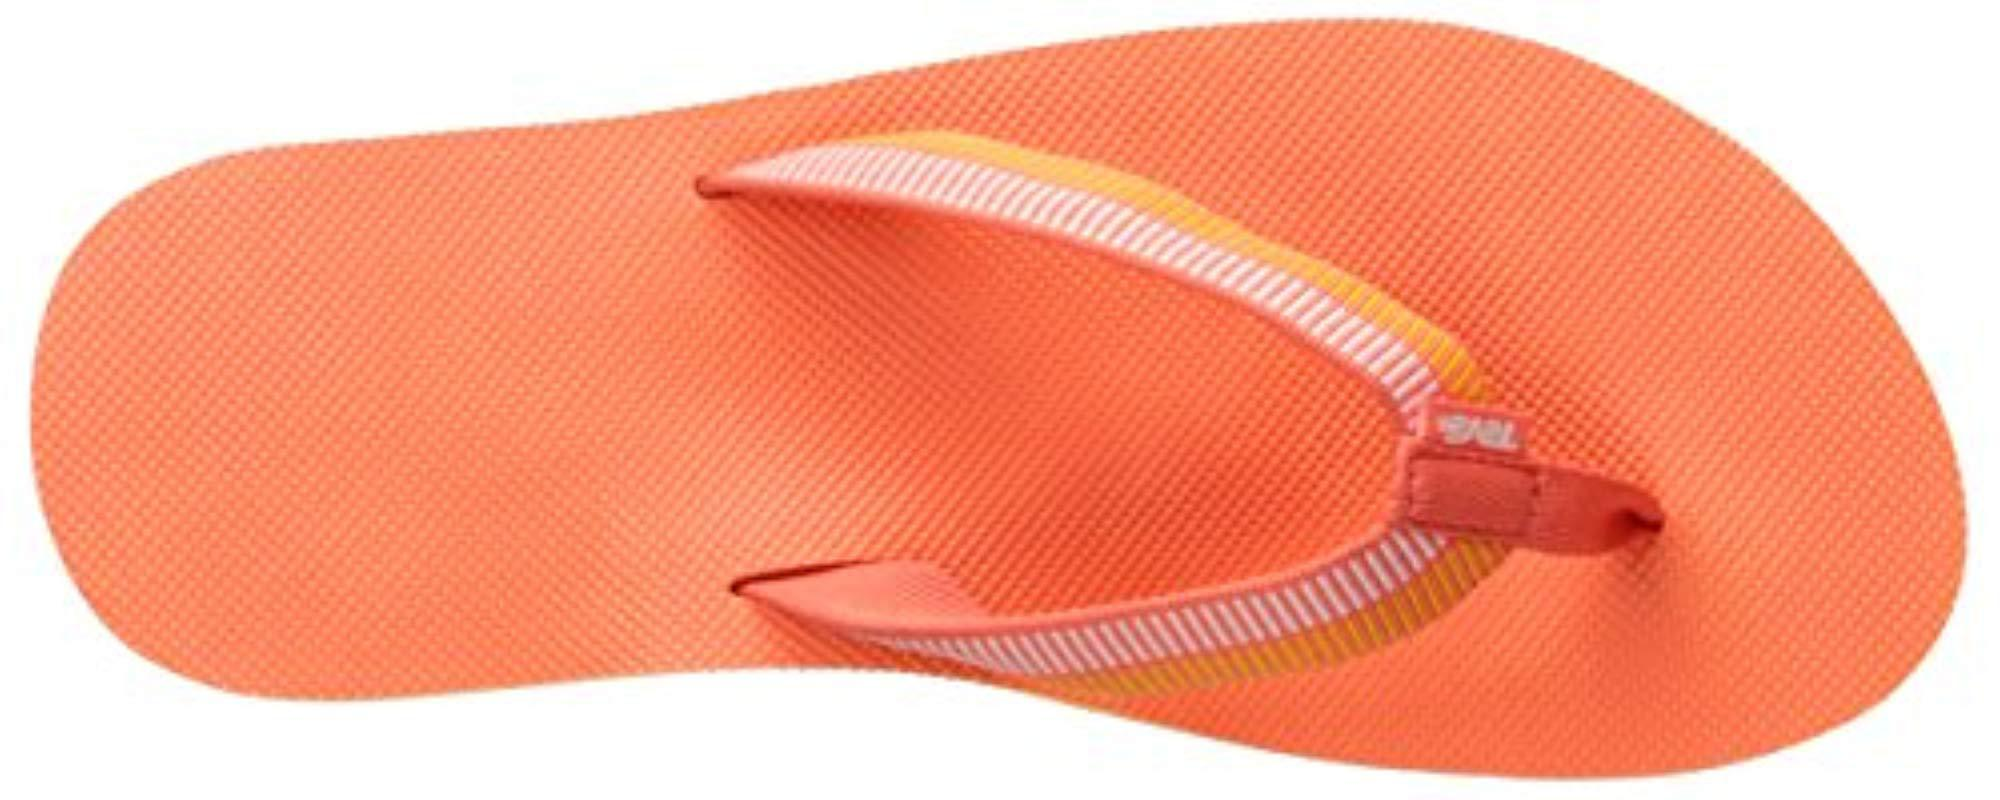 ddc84d5f5e5f8 Teva - Orange Deckers Flip-flop - Lyst. View fullscreen